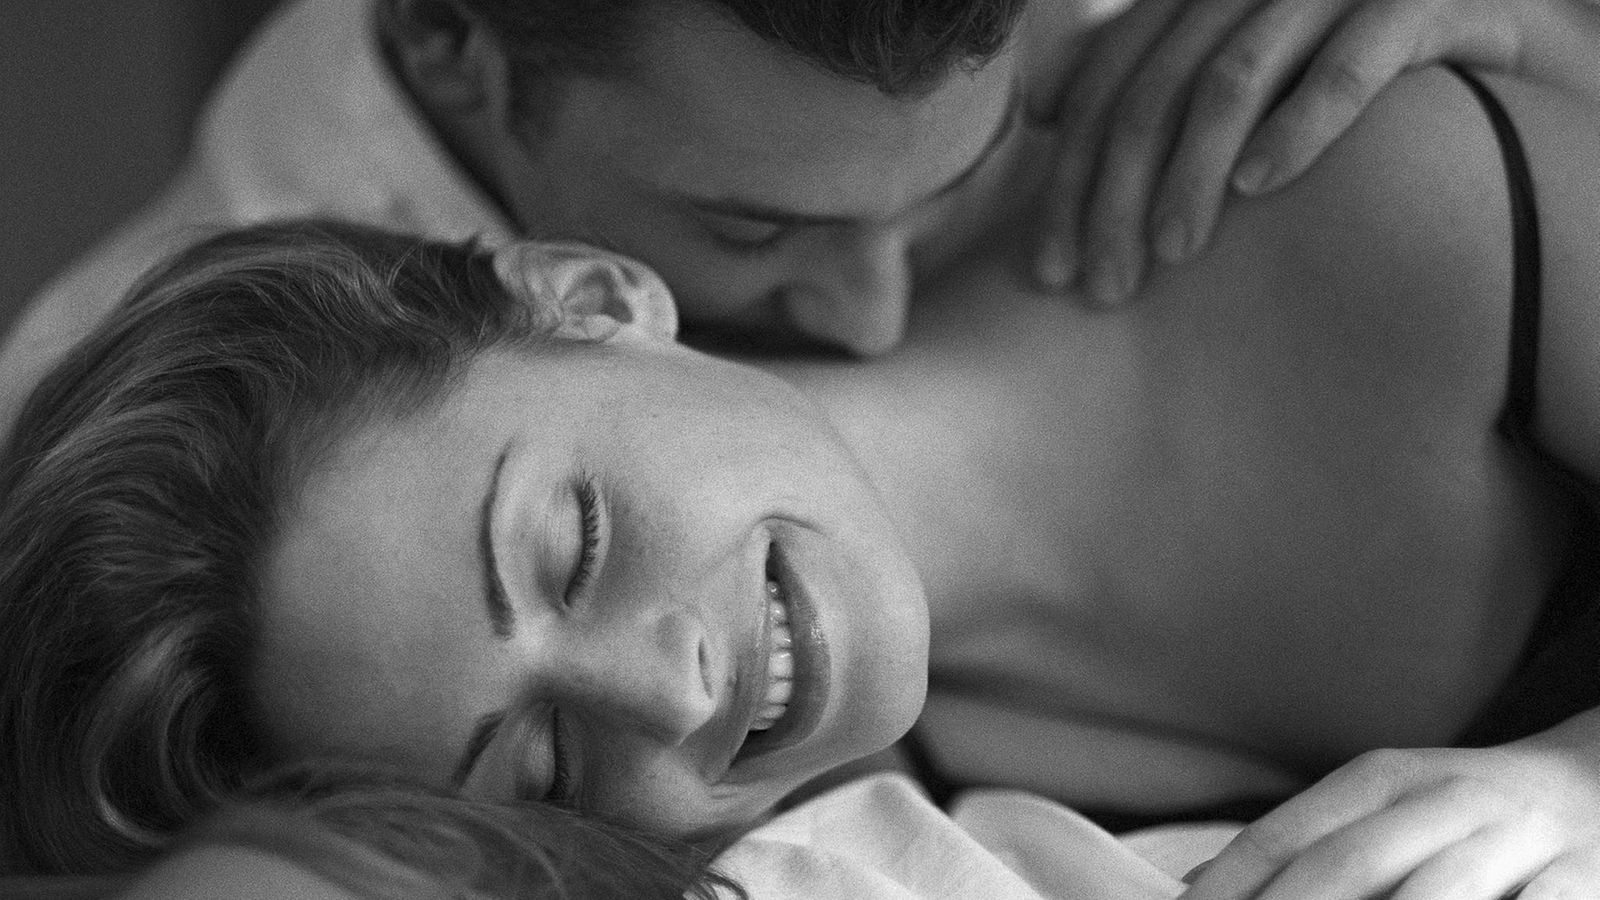 rakastella seksiä naisen ejakulaation